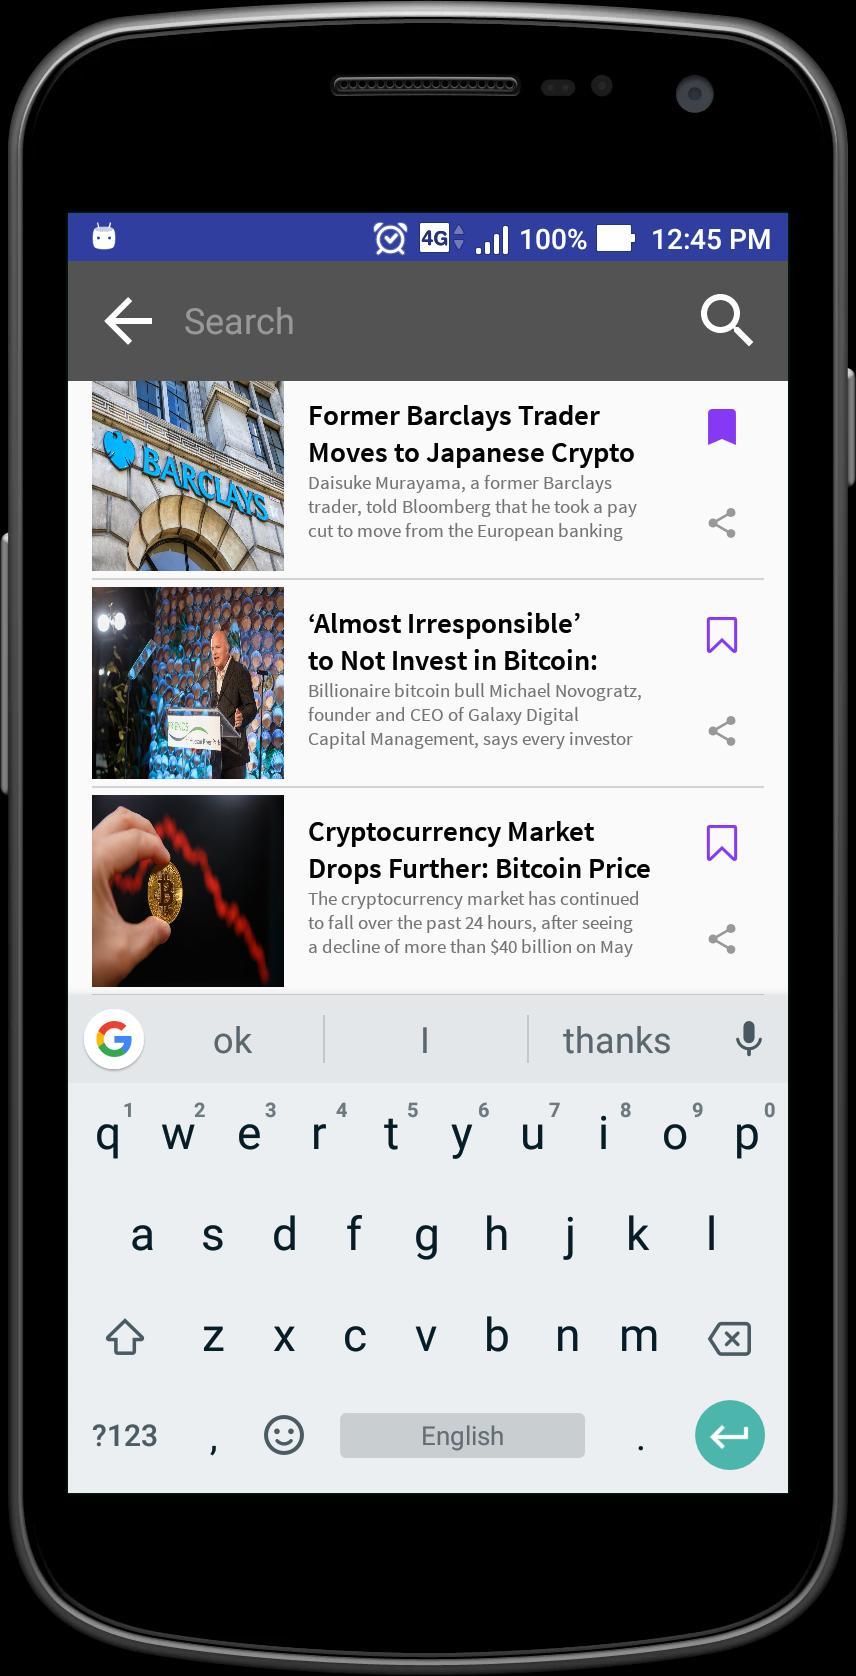 bitcoin news feed)